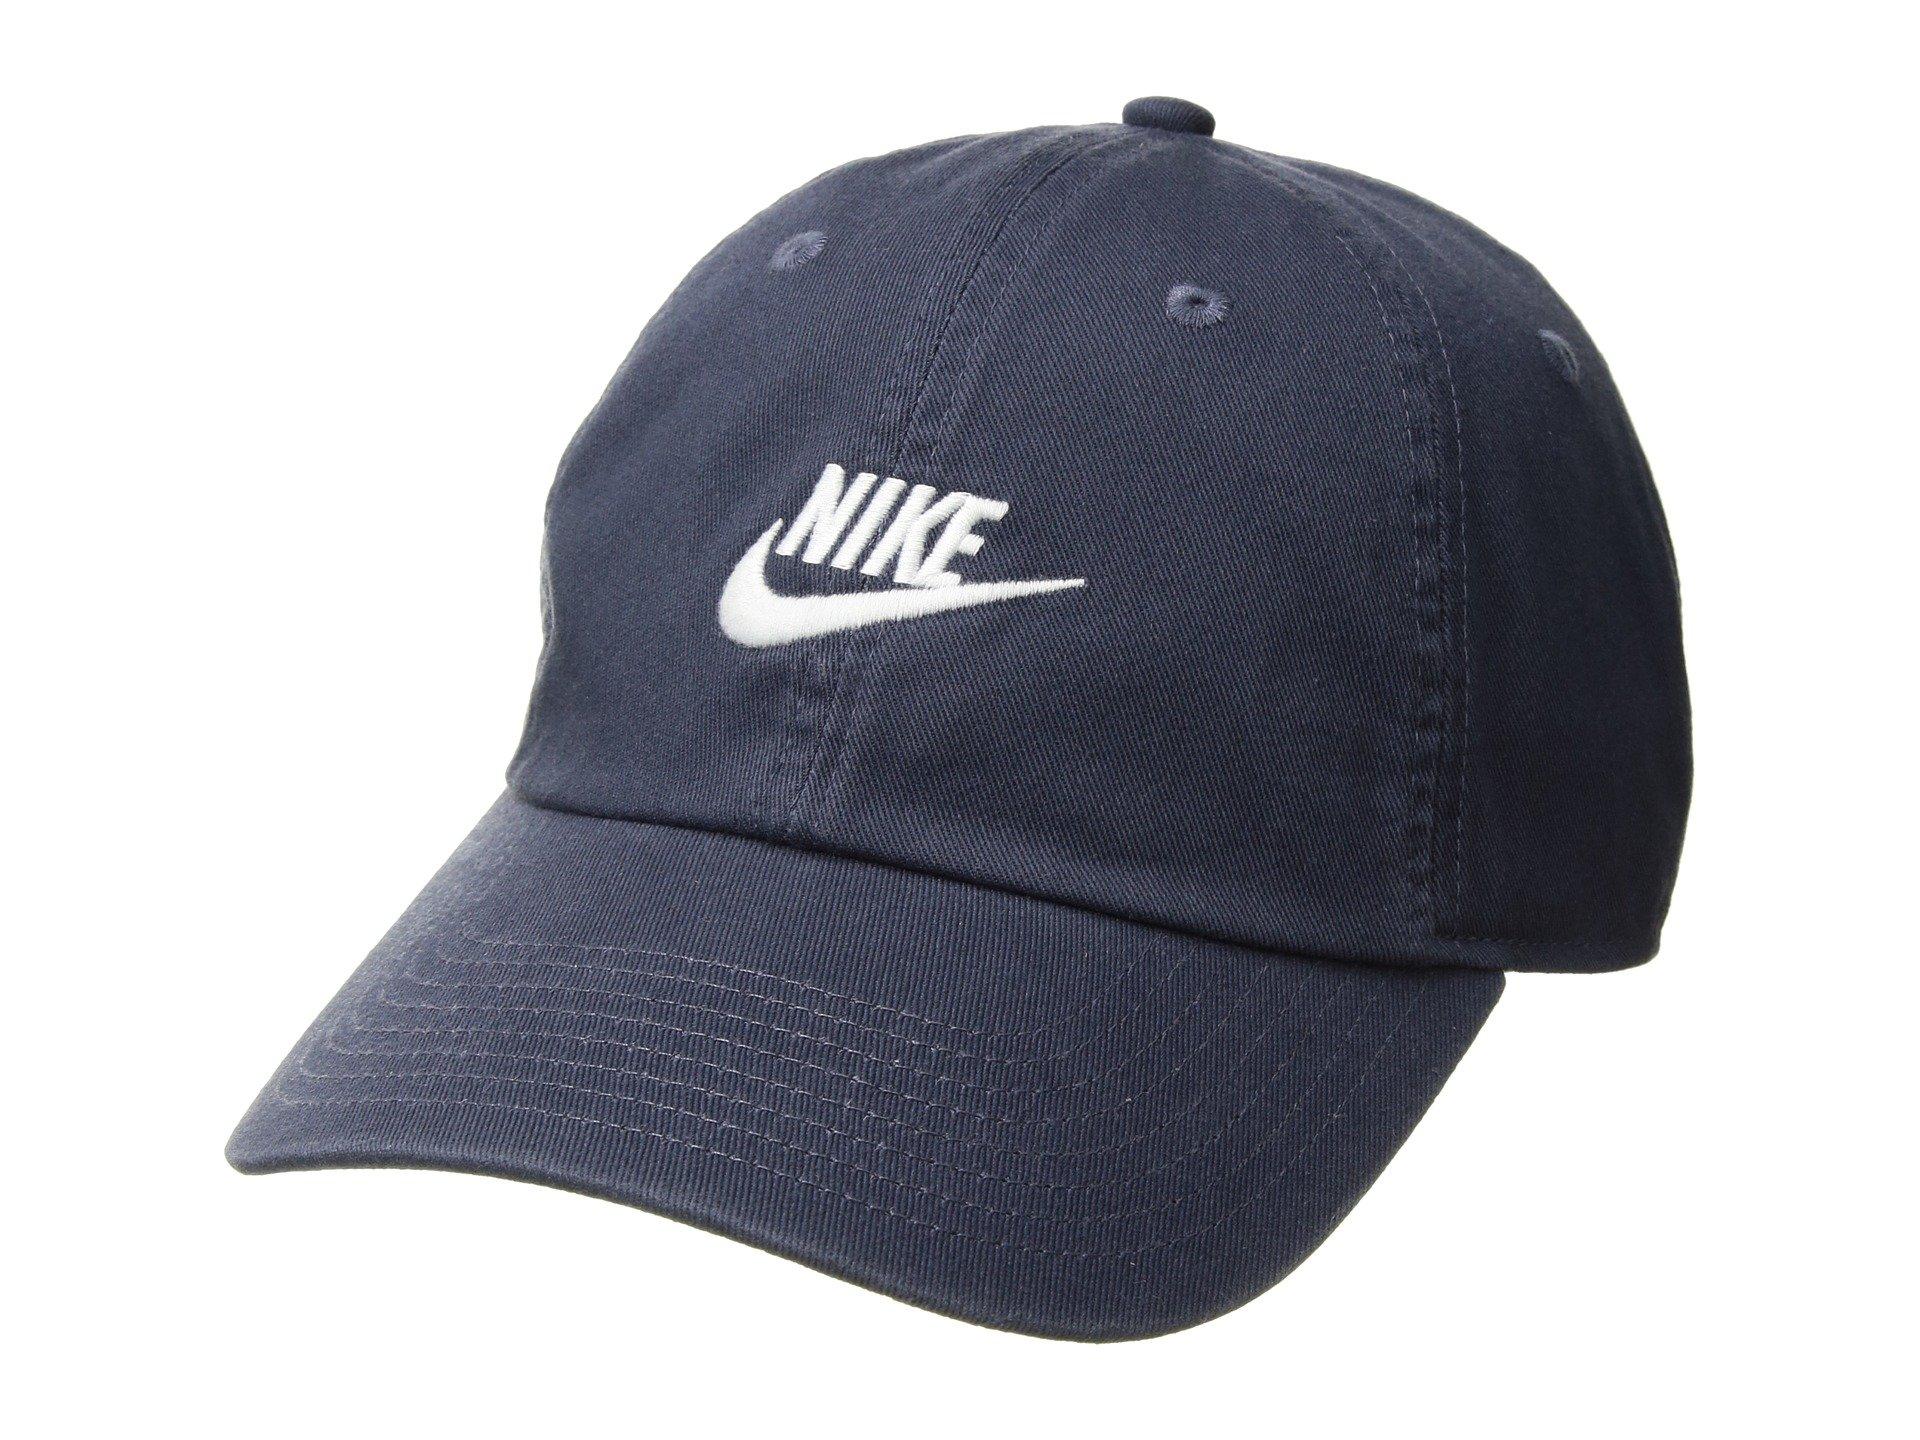 Nike Men's/Unisex Heritage 86 Hat (Thunder Blue/White)